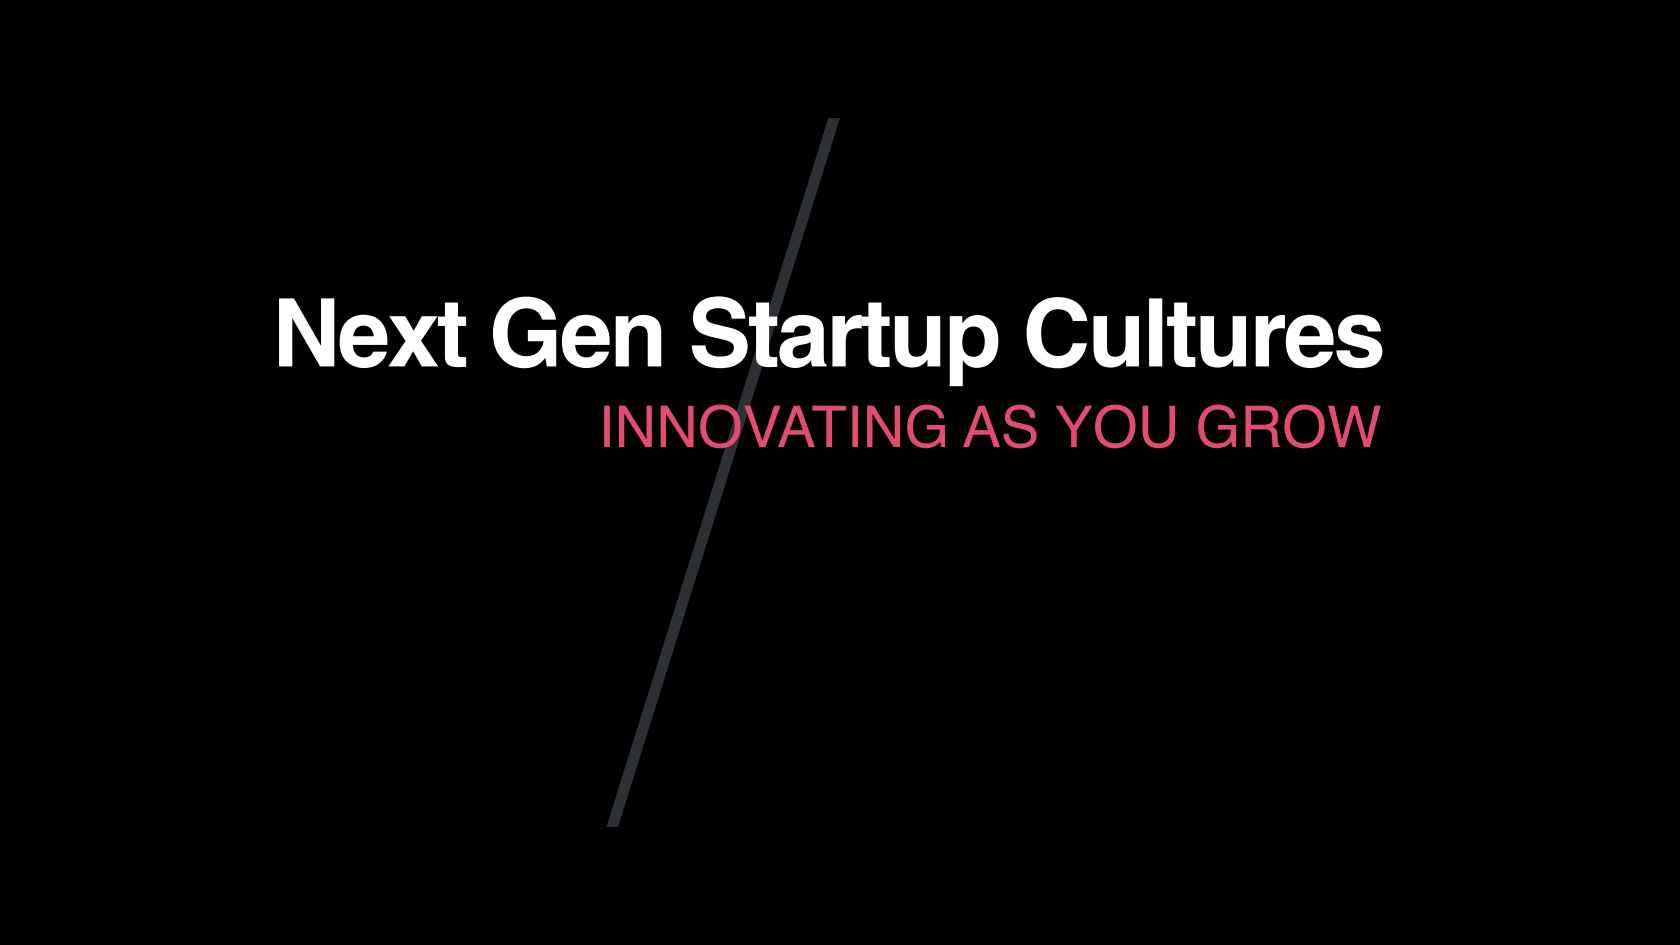 Next-gen Start-up Cultures: Innovating as You Grow